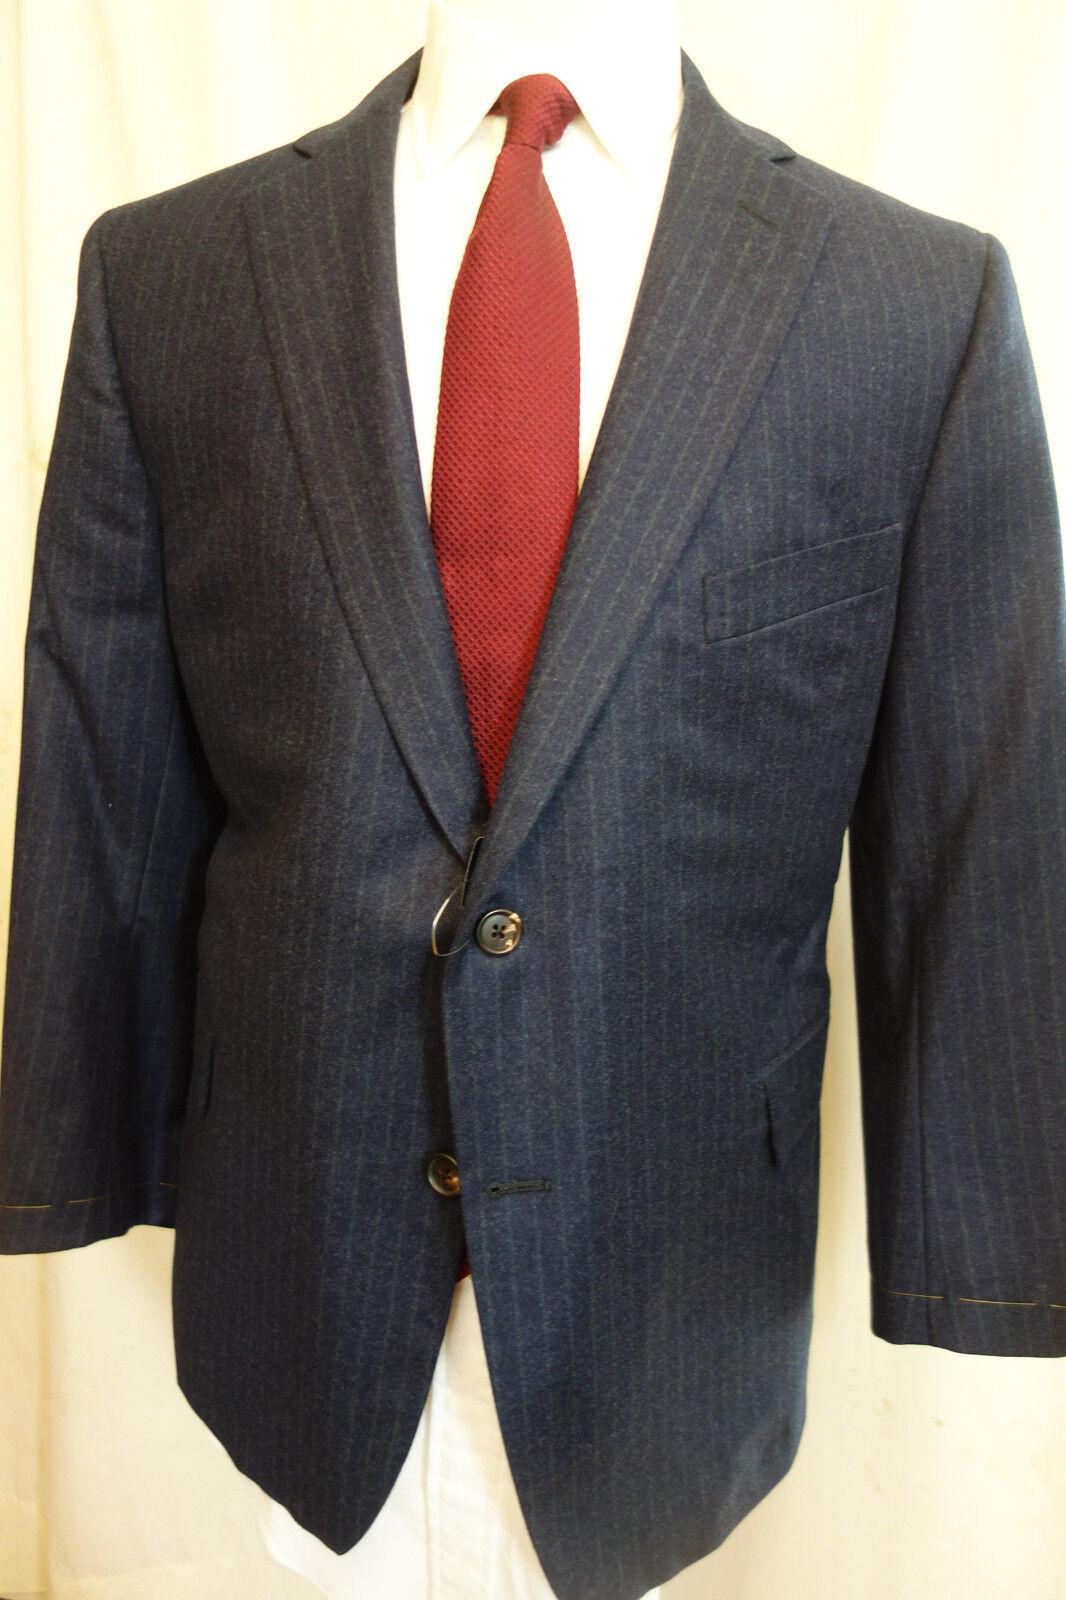 NWOT Brooks Brothers Golden Fleece Blau Chalk Stripe Sport Coat 44S